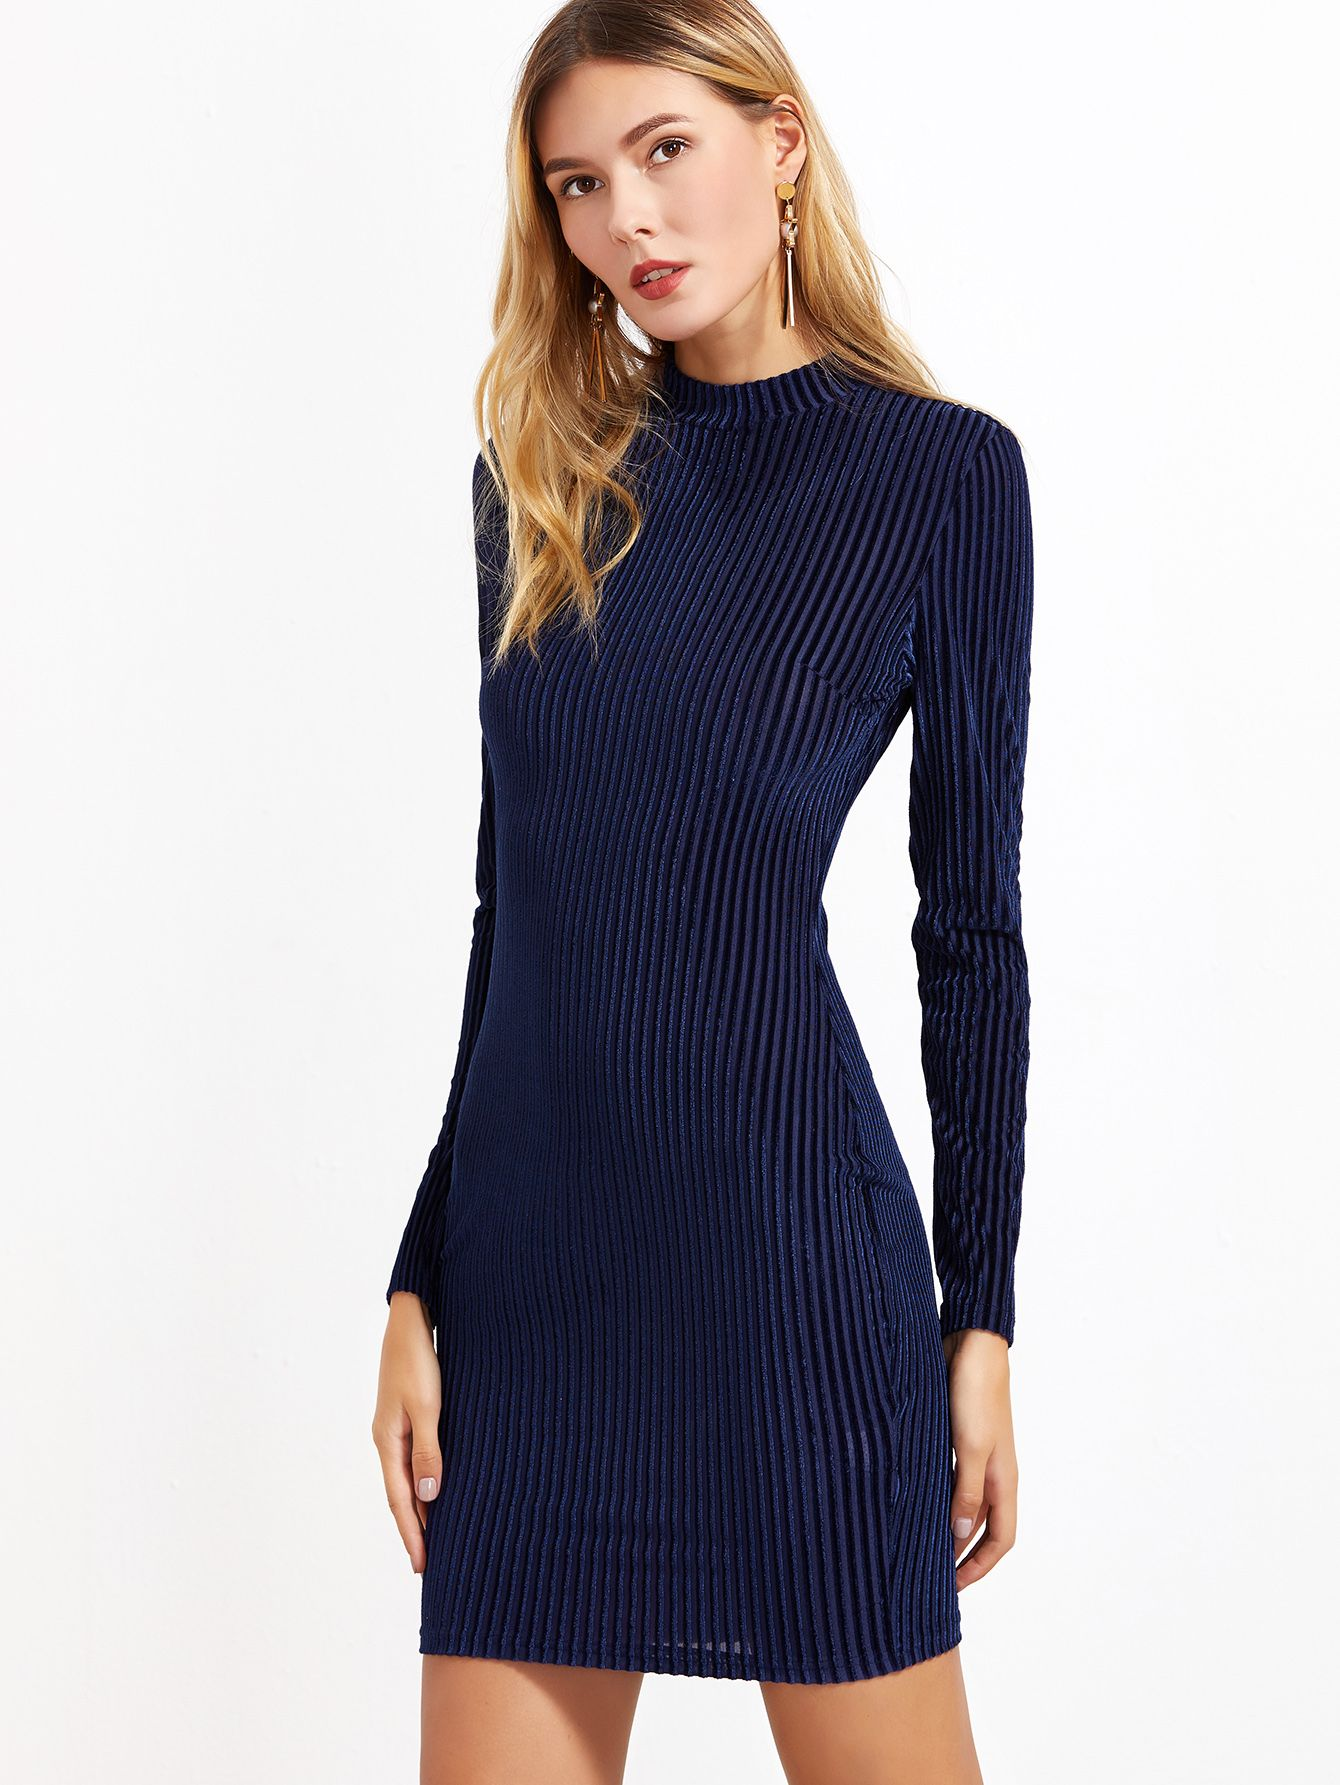 2cdd0cf464 Shop Navy Mock Neck Striped Velvet Bodycon Dress online. SheIn offers Navy  Mock Neck Striped Velvet Bodycon Dress & more to fit your fashionable needs.